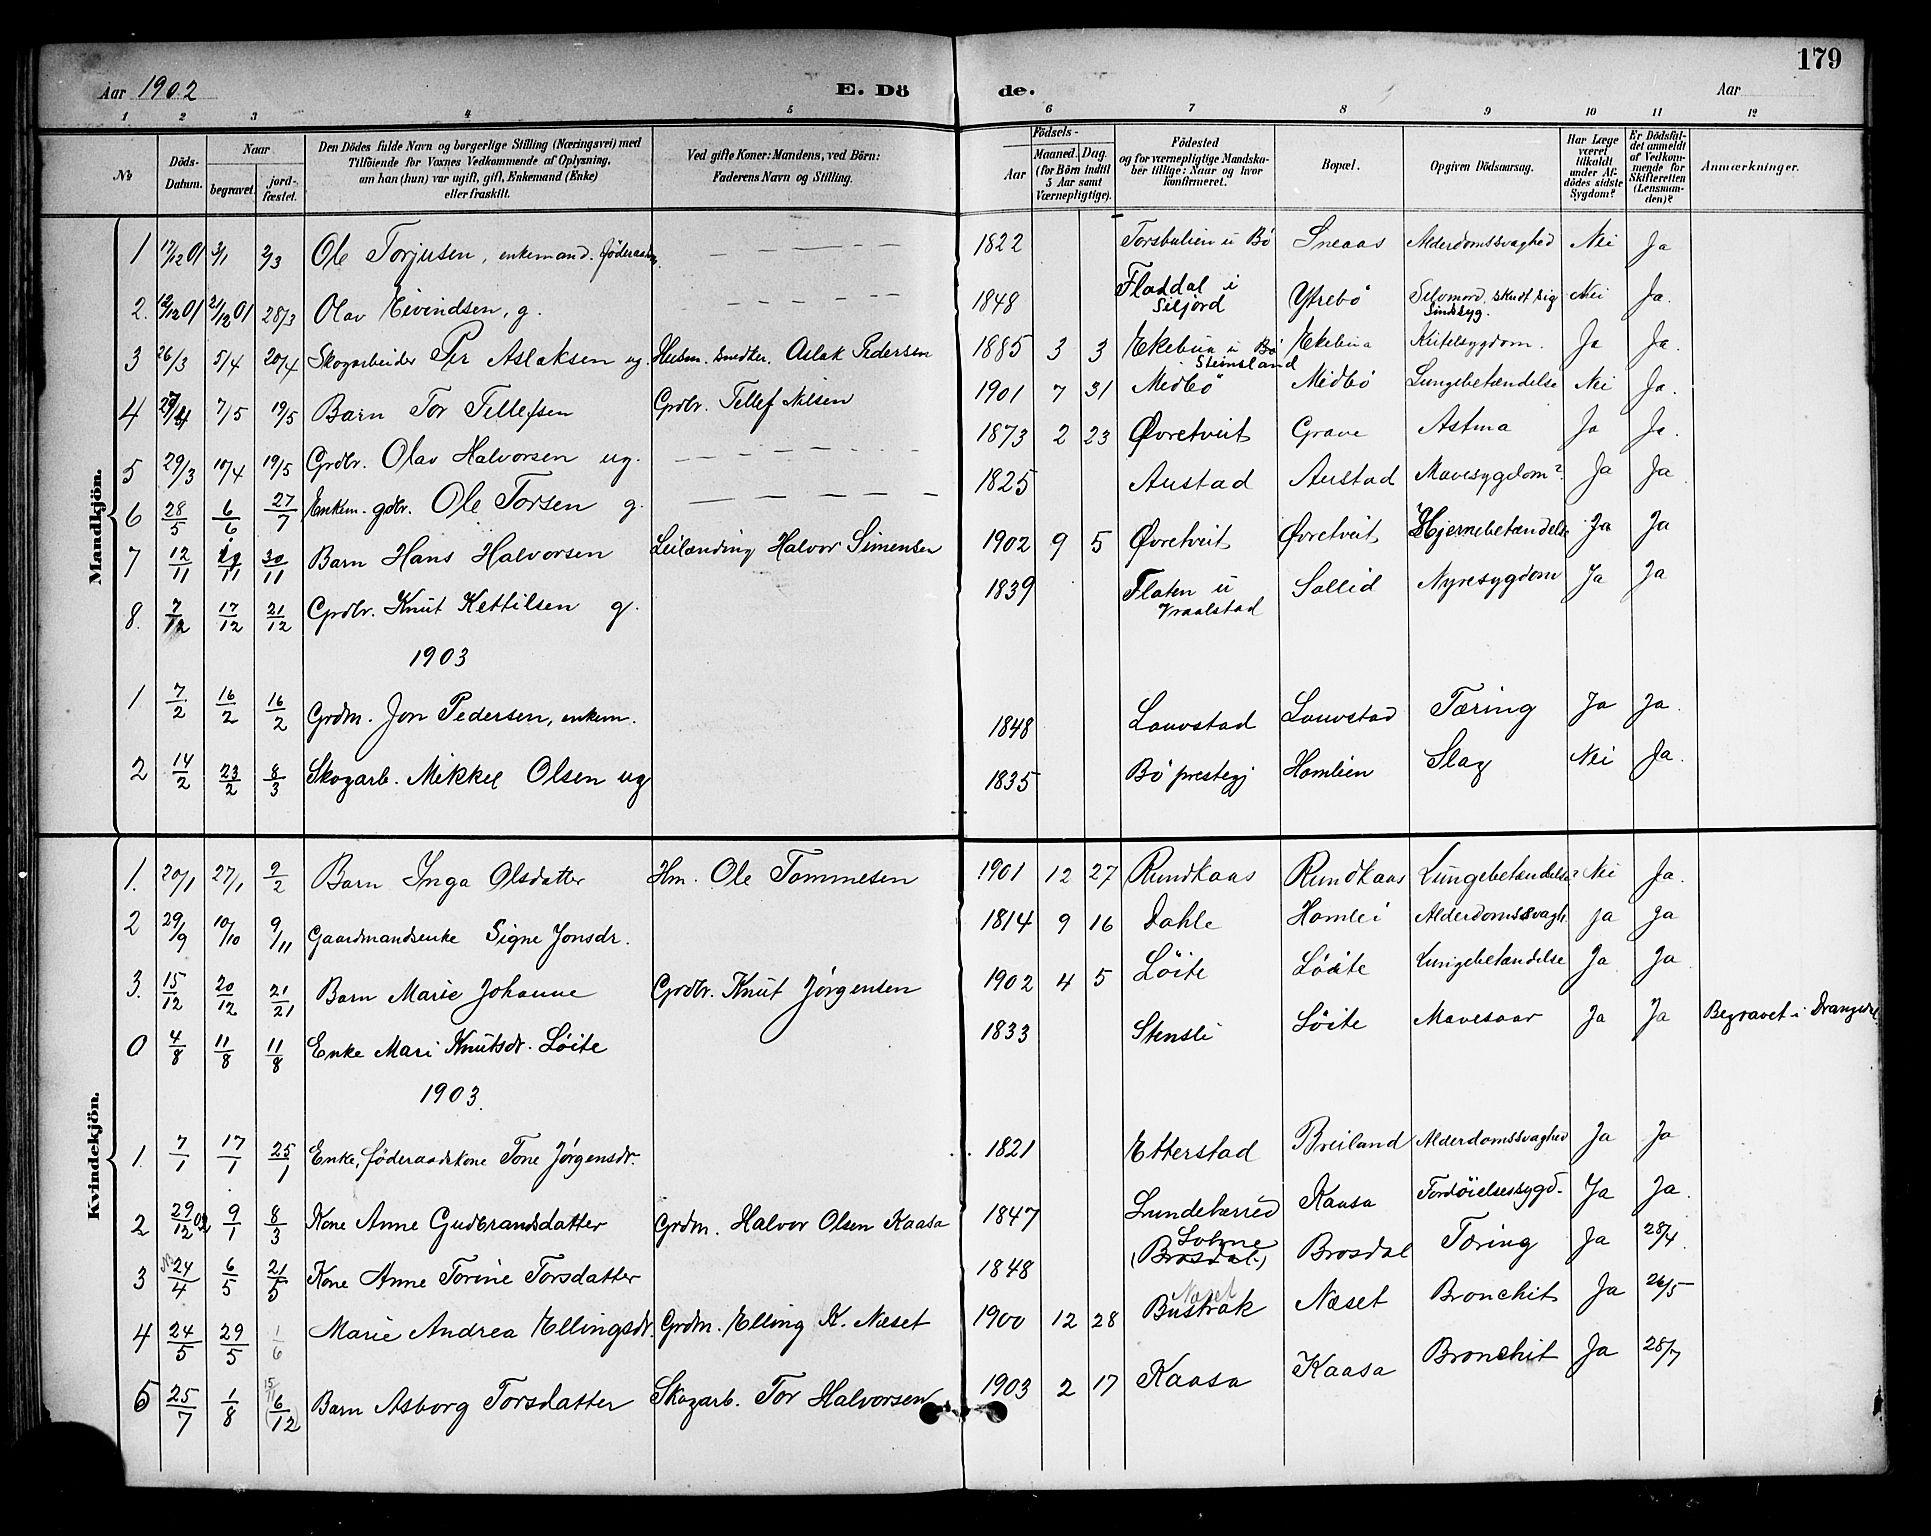 SAKO, Drangedal kirkebøker, G/Gb/L0002: Klokkerbok nr. II 2, 1895-1918, s. 179